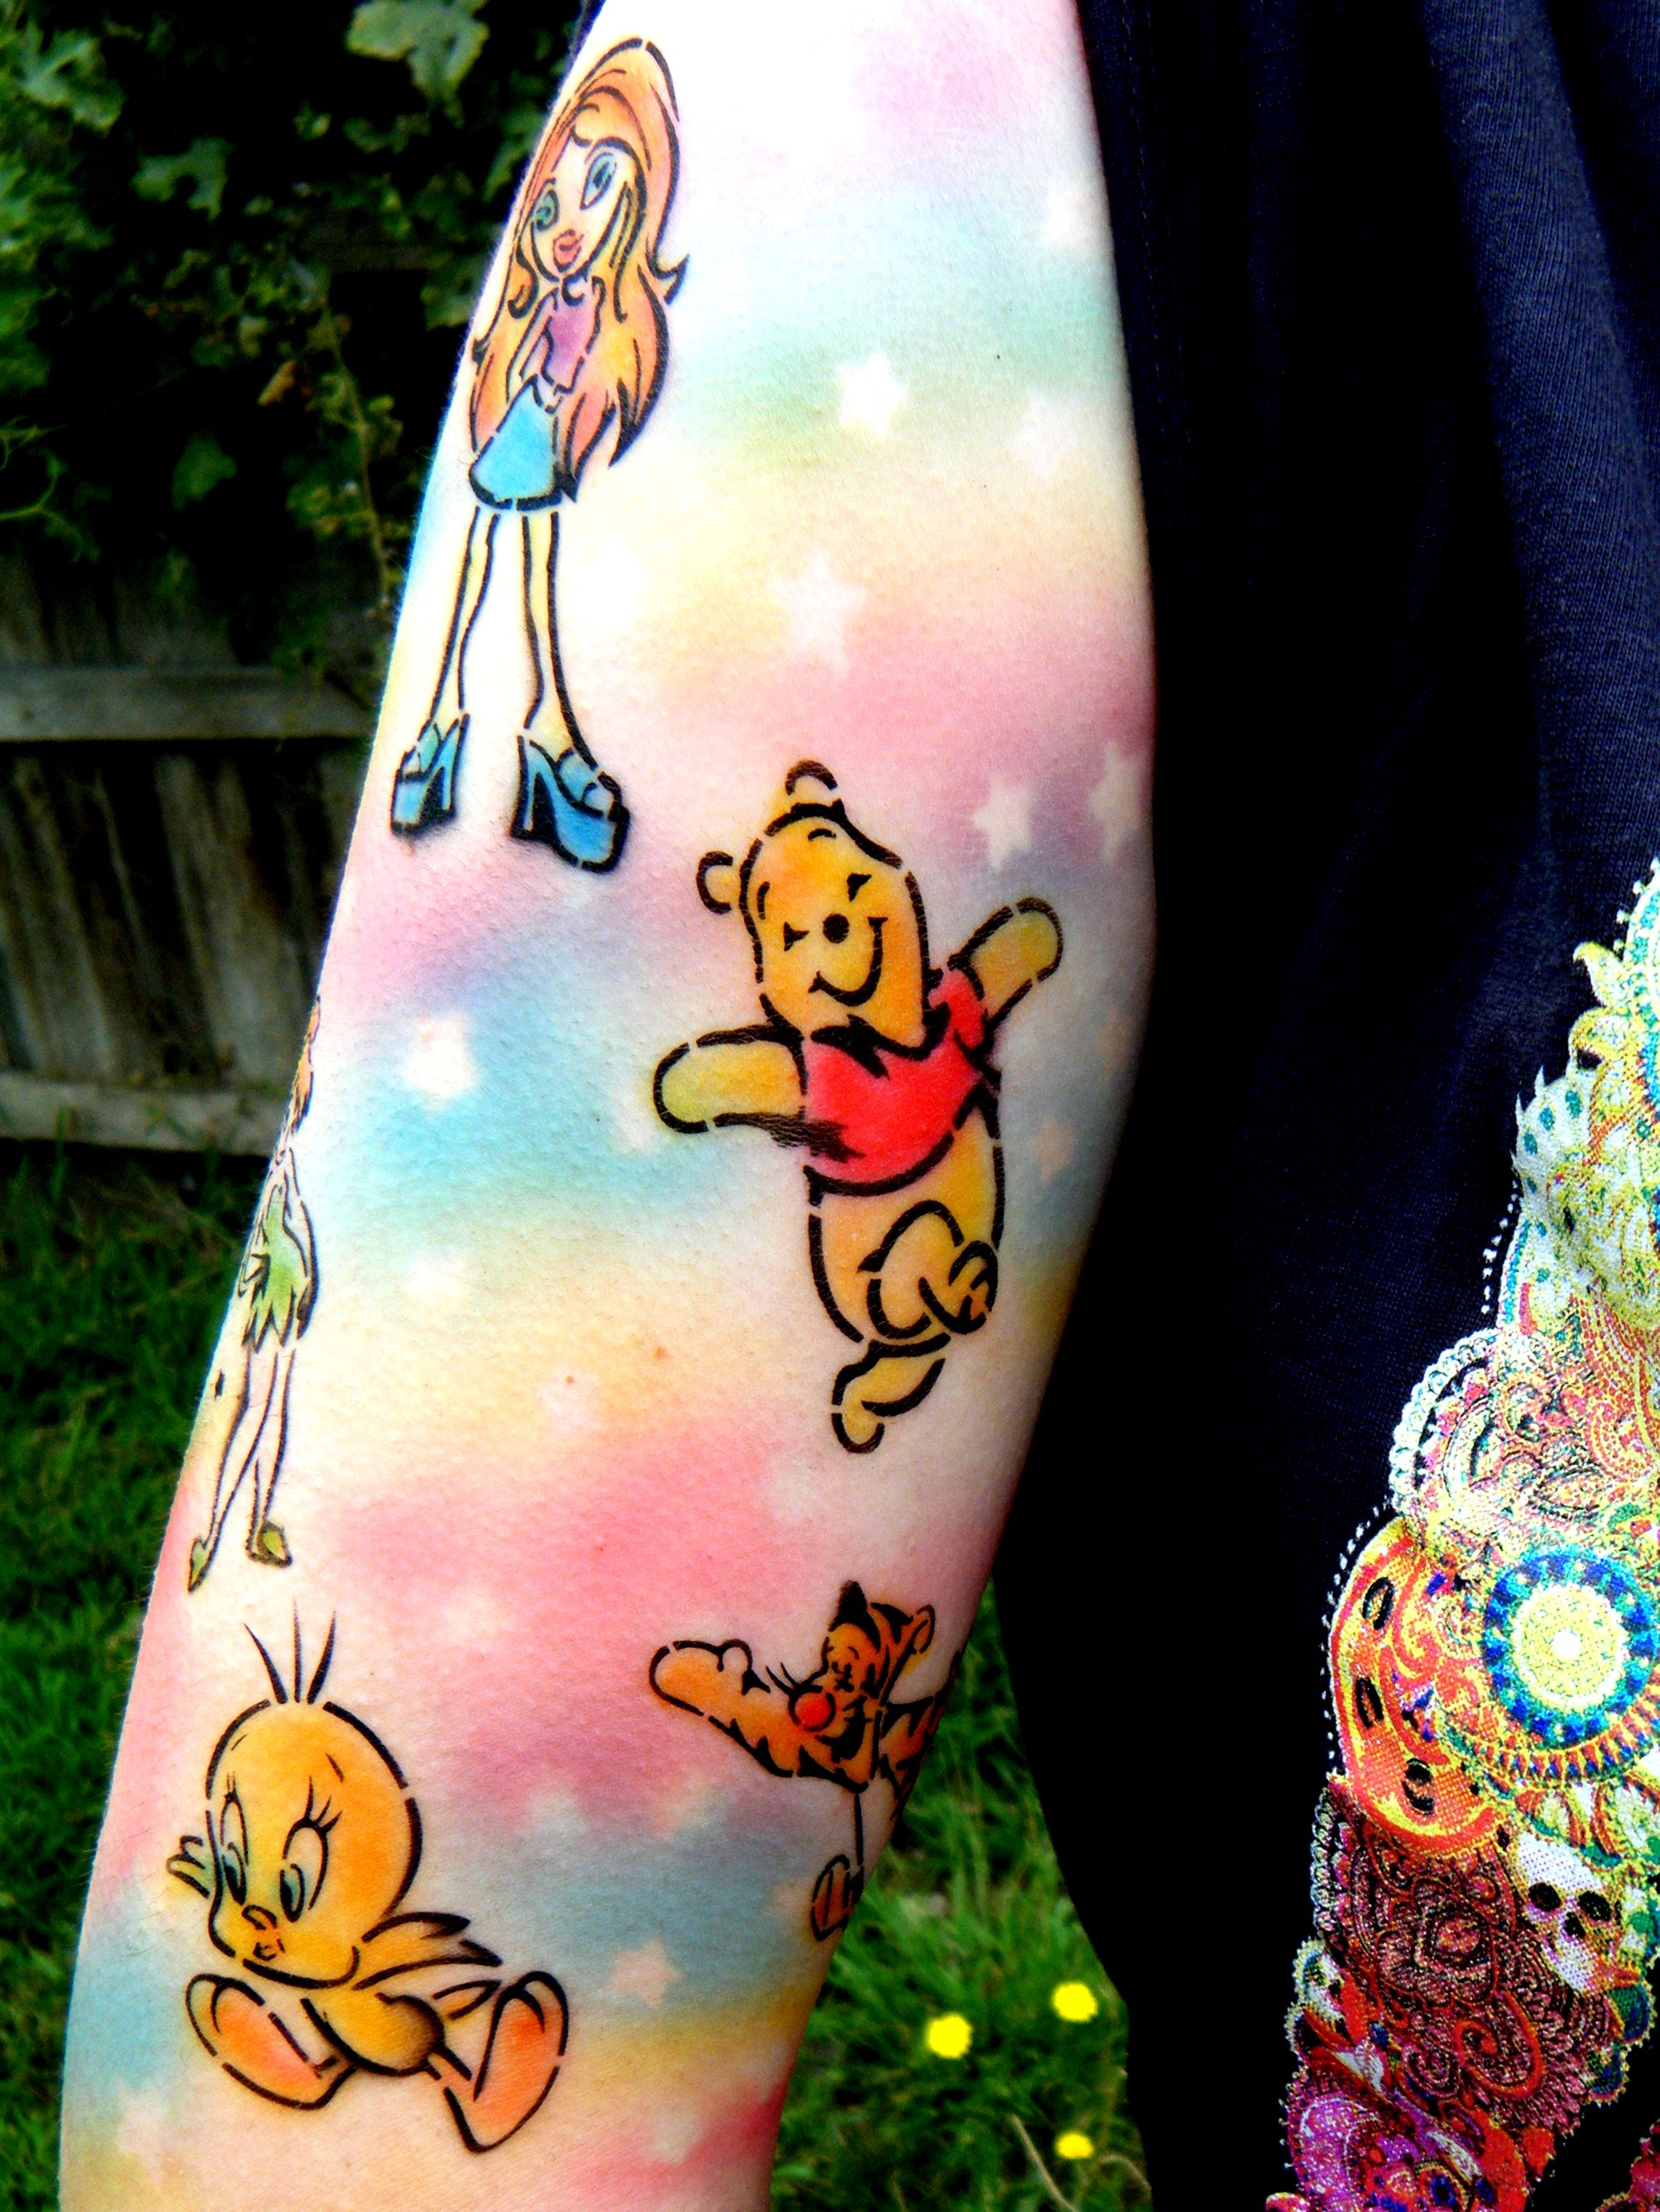 Cute as cartoon inspired airbrush tattoo sleeve with